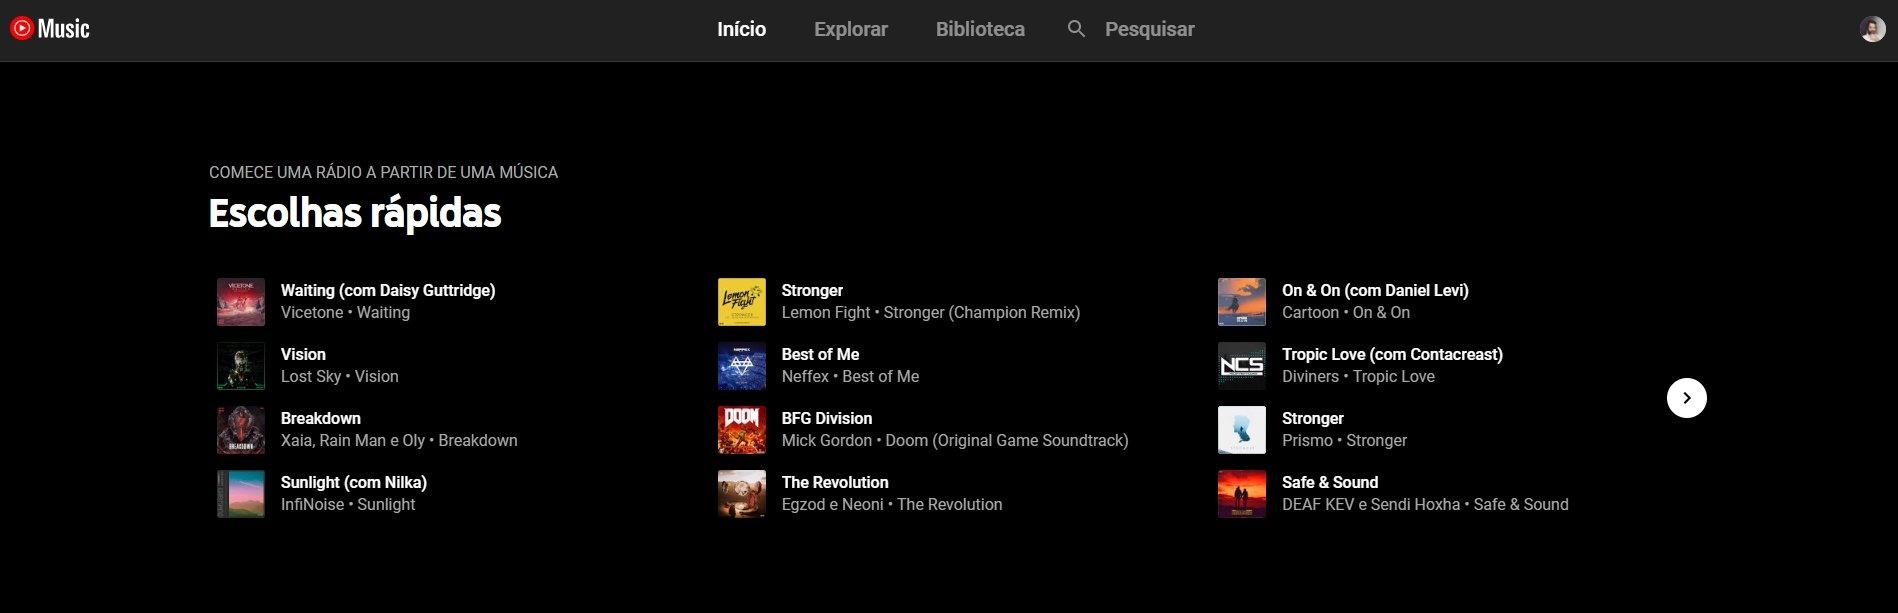 escolhas rápidas YouTube music